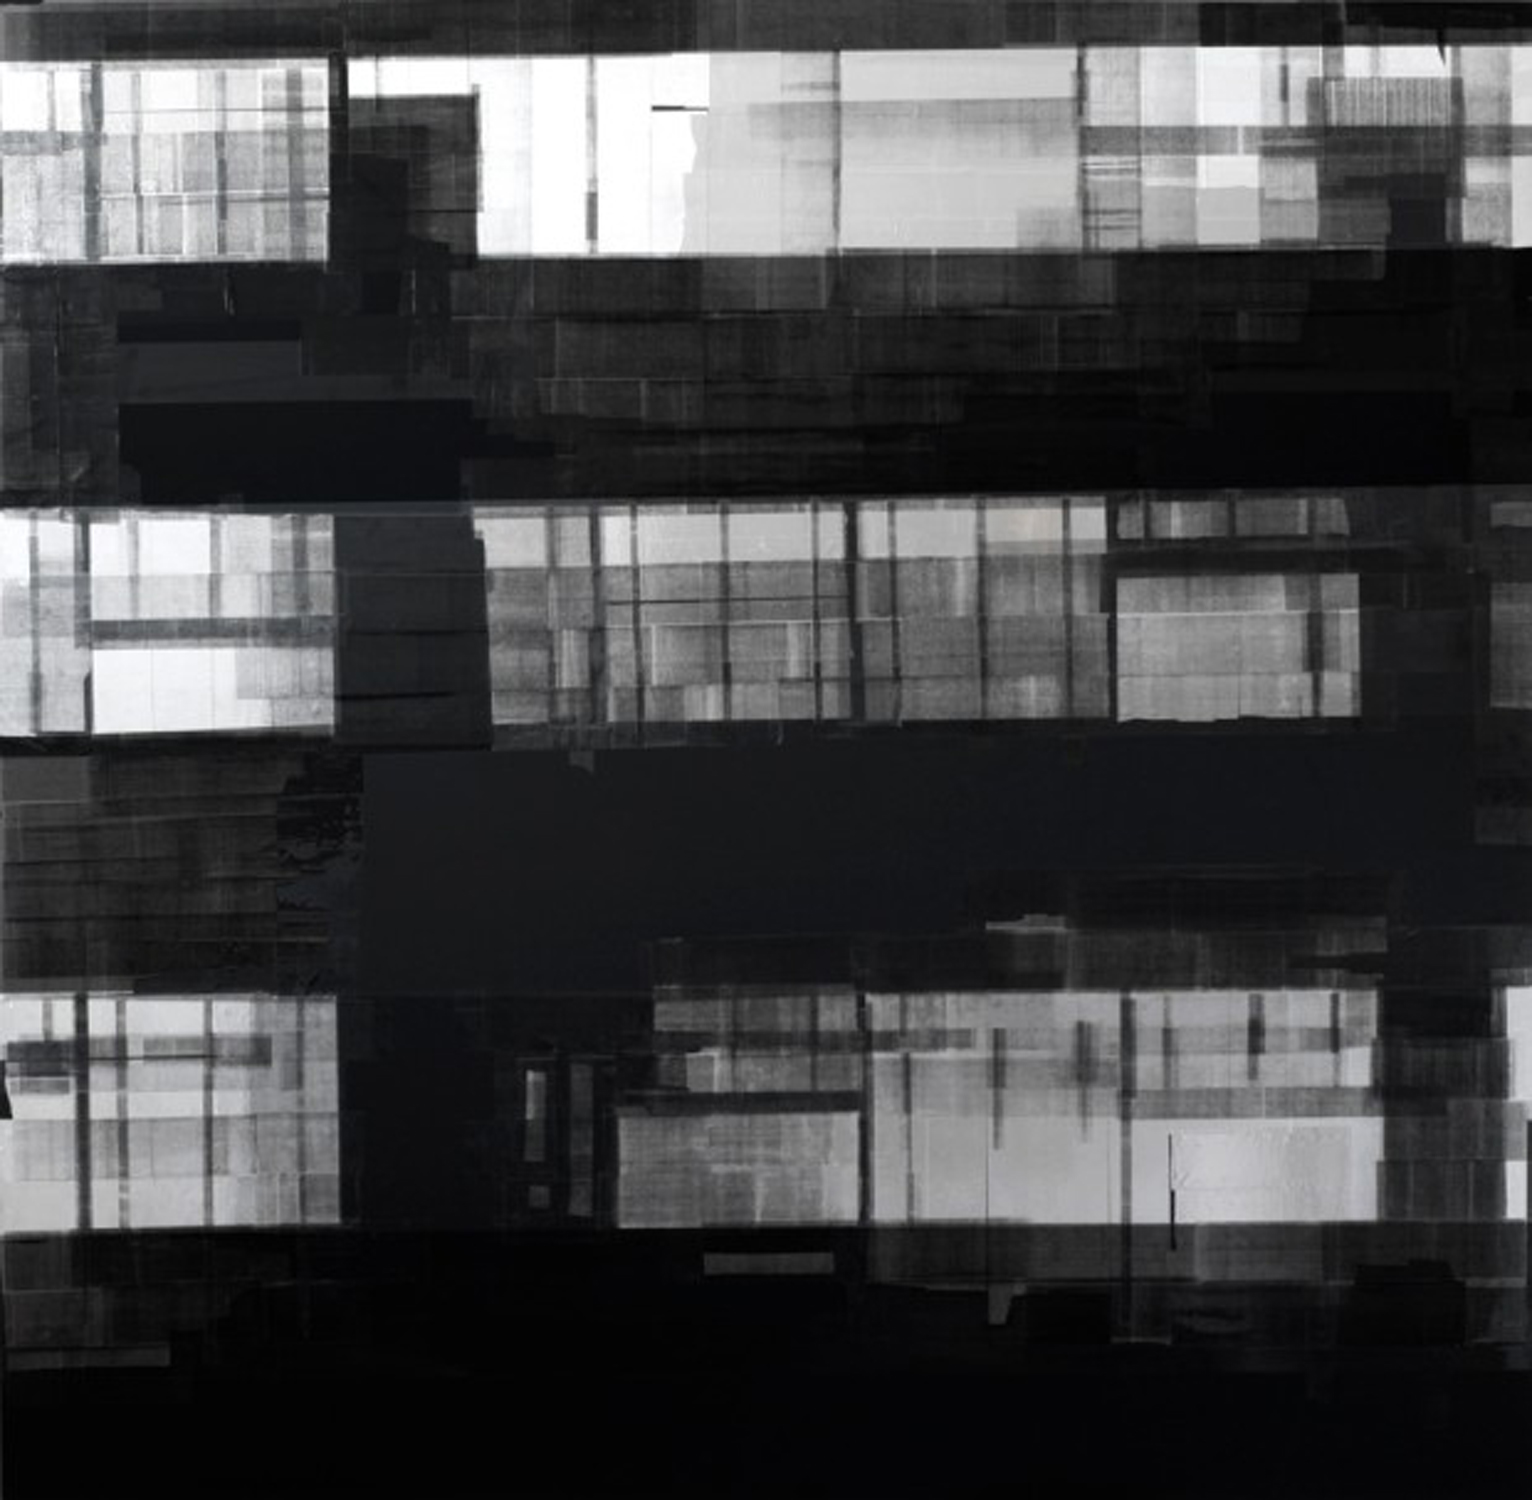 MARK KHAISMAN | Space of Suspense 3